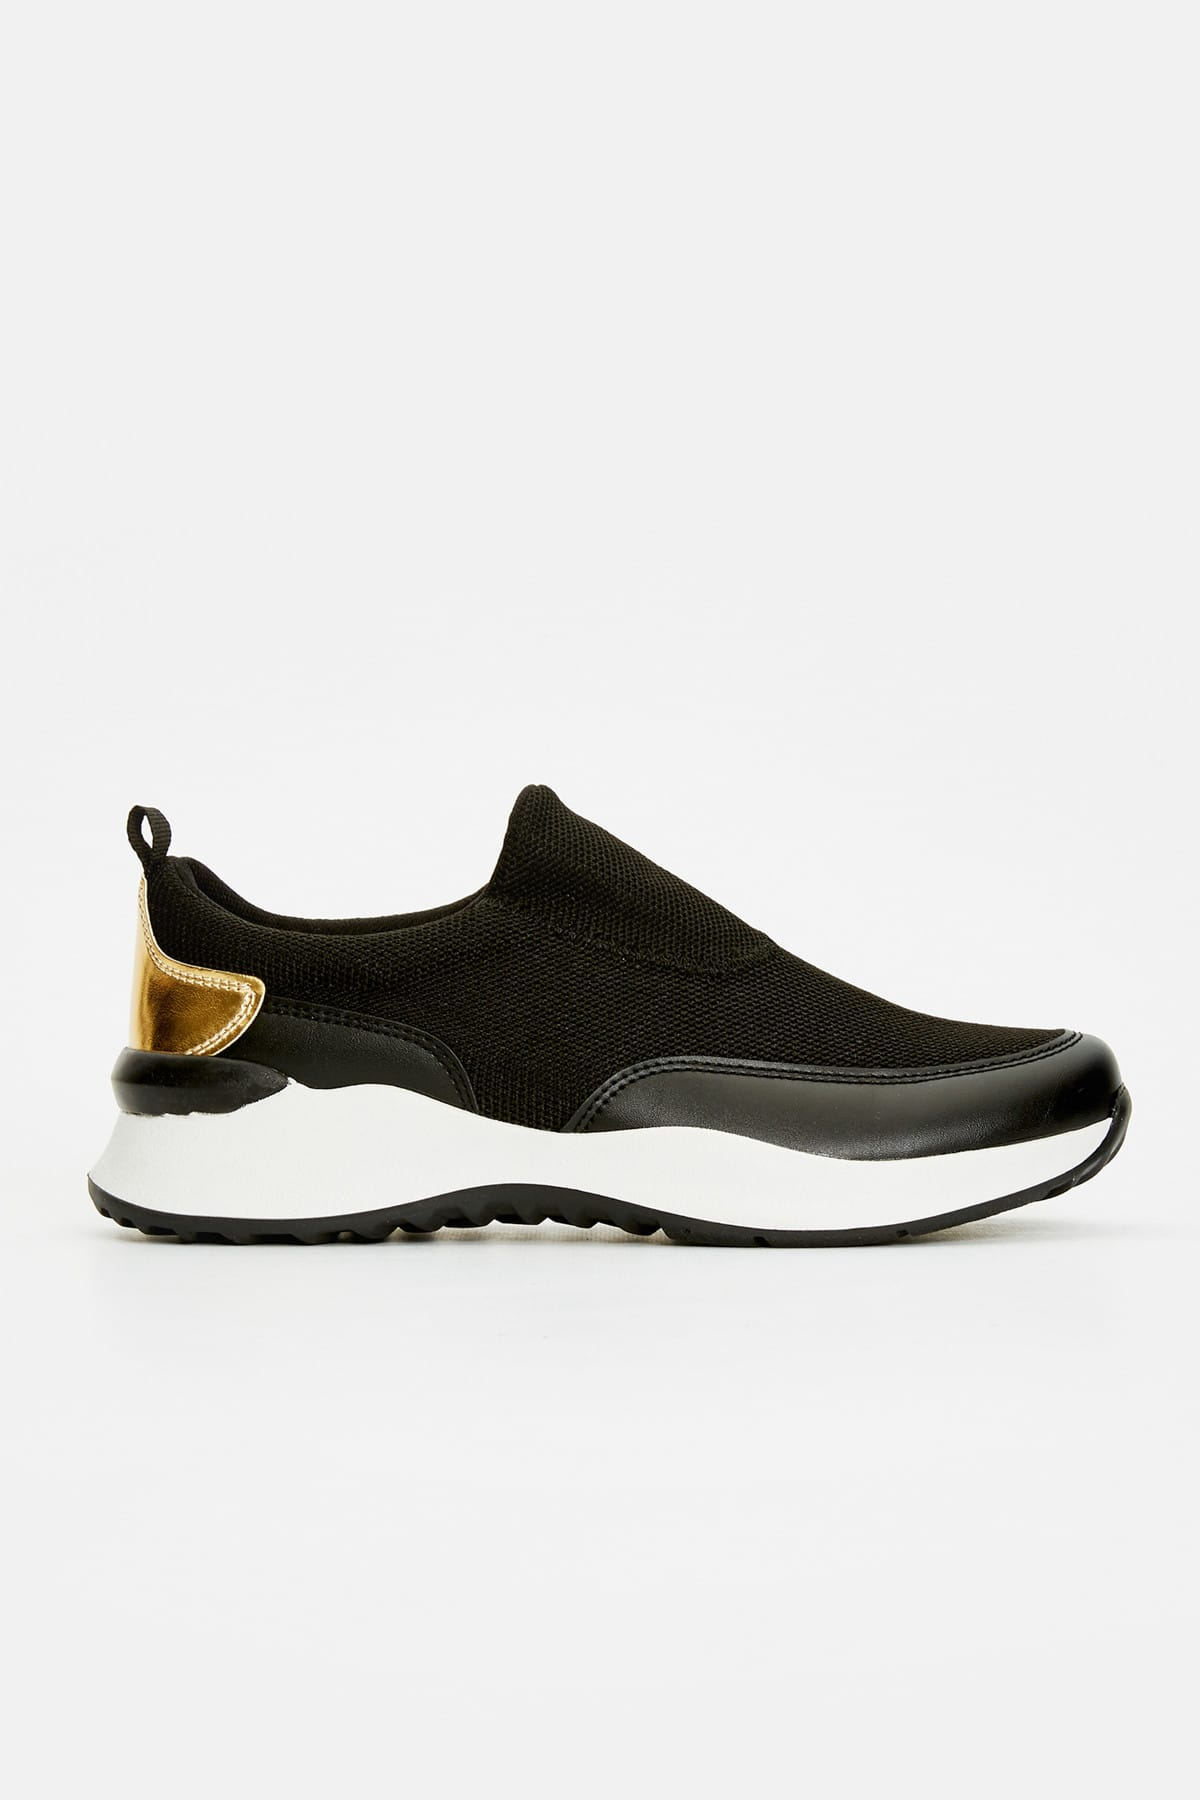 LC Waikiki Kadın Siyah Ayakkabı 9S5632Z8 1